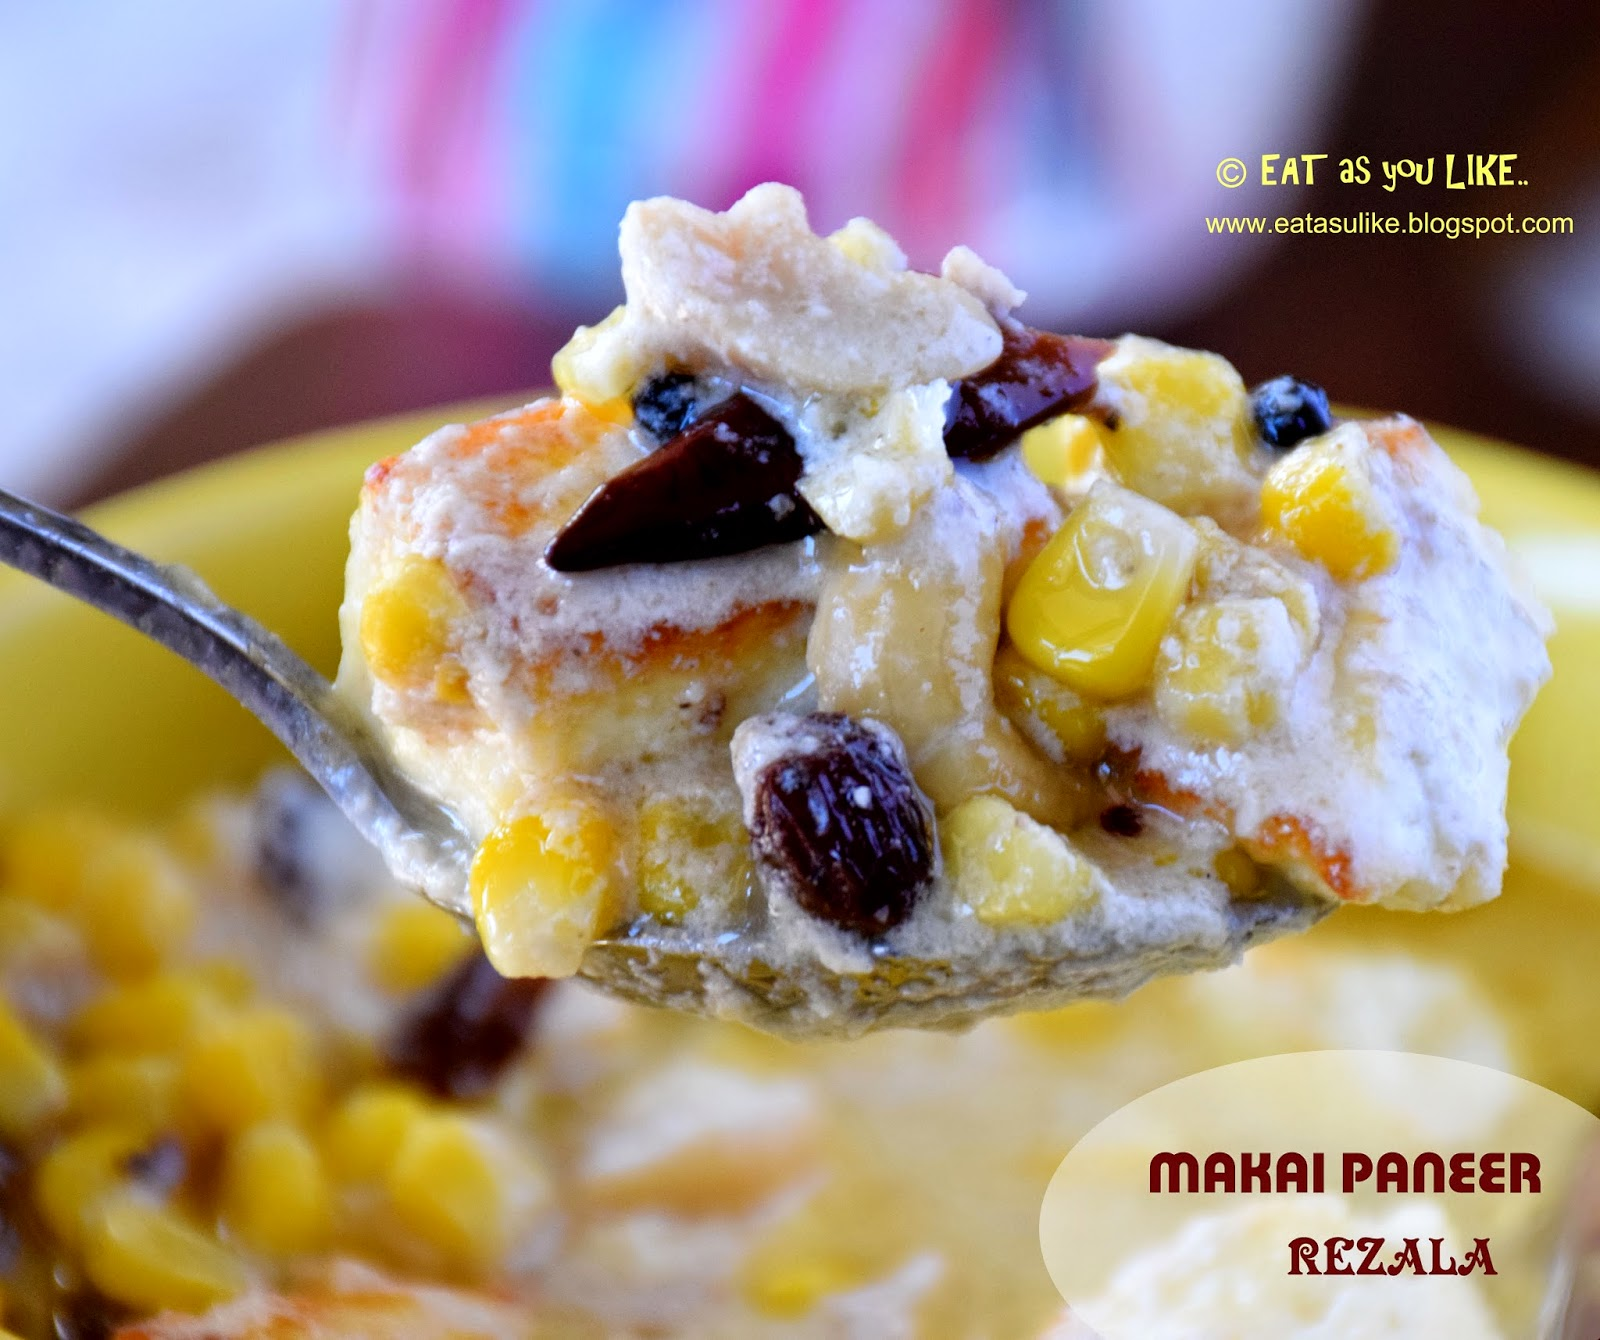 http://eatasulike.blogspot.com.au/2014/09/makai-paneer-rezala.html